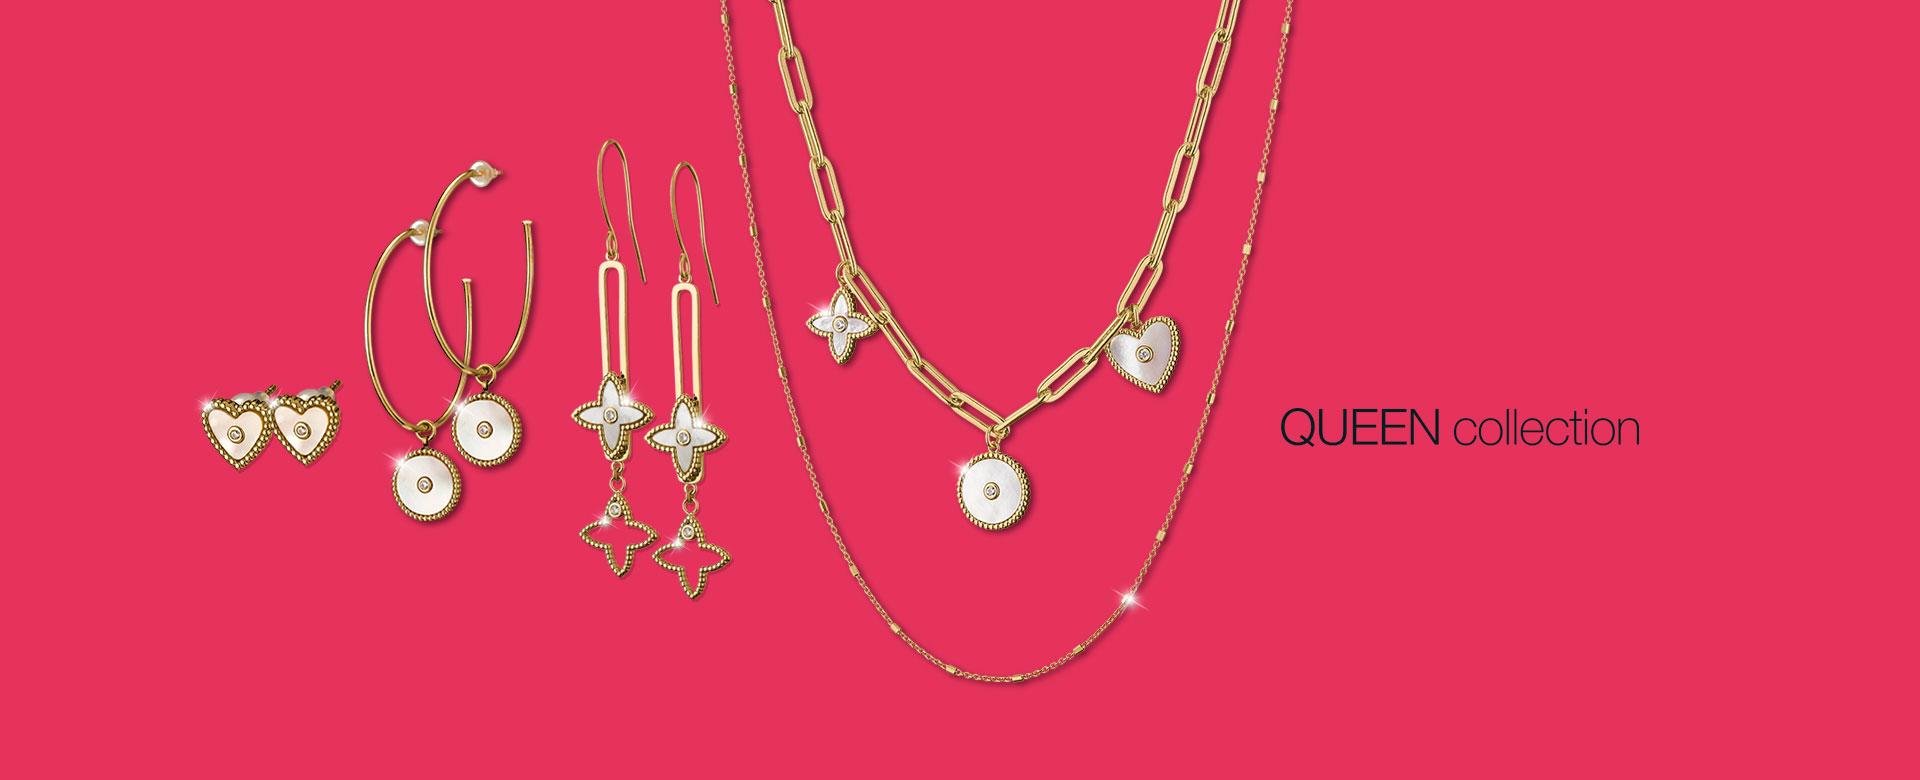 Queen Summer Sales - Loisir